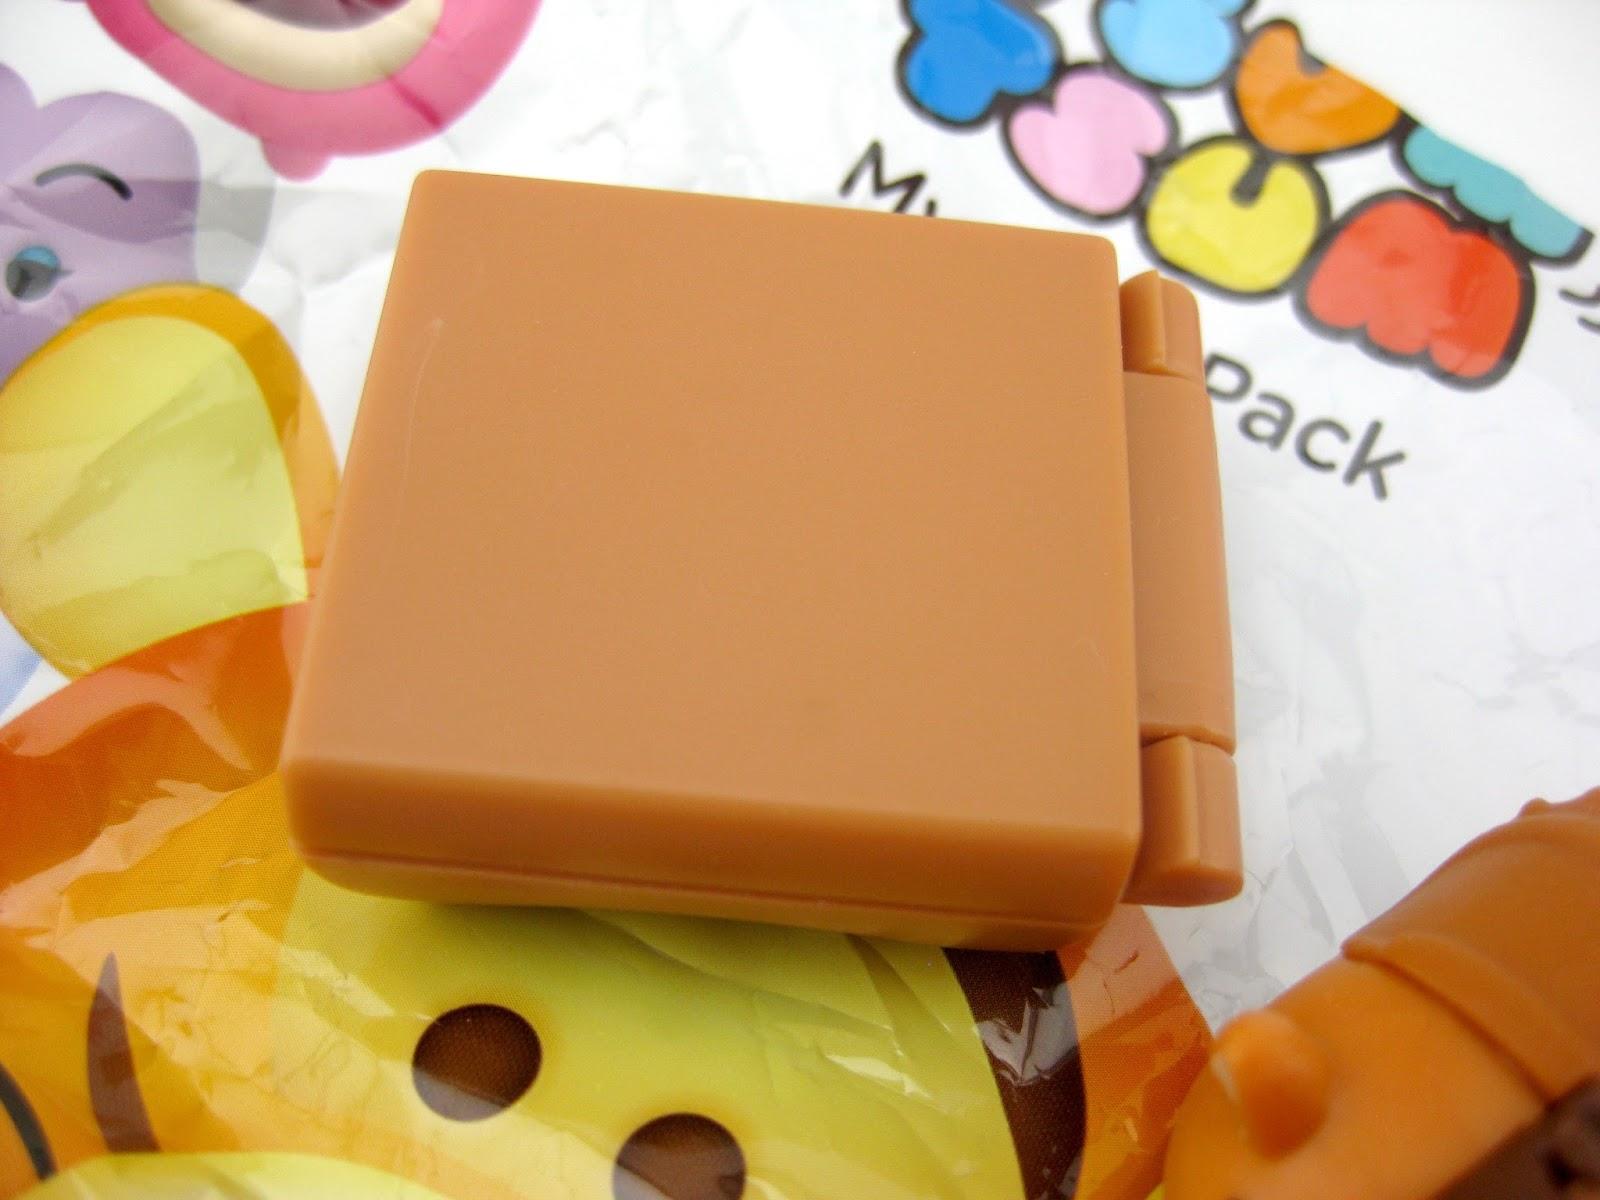 Disney Tsum Tsum Mystery Stack Packs Jakks Pacific Series 4 bullseye